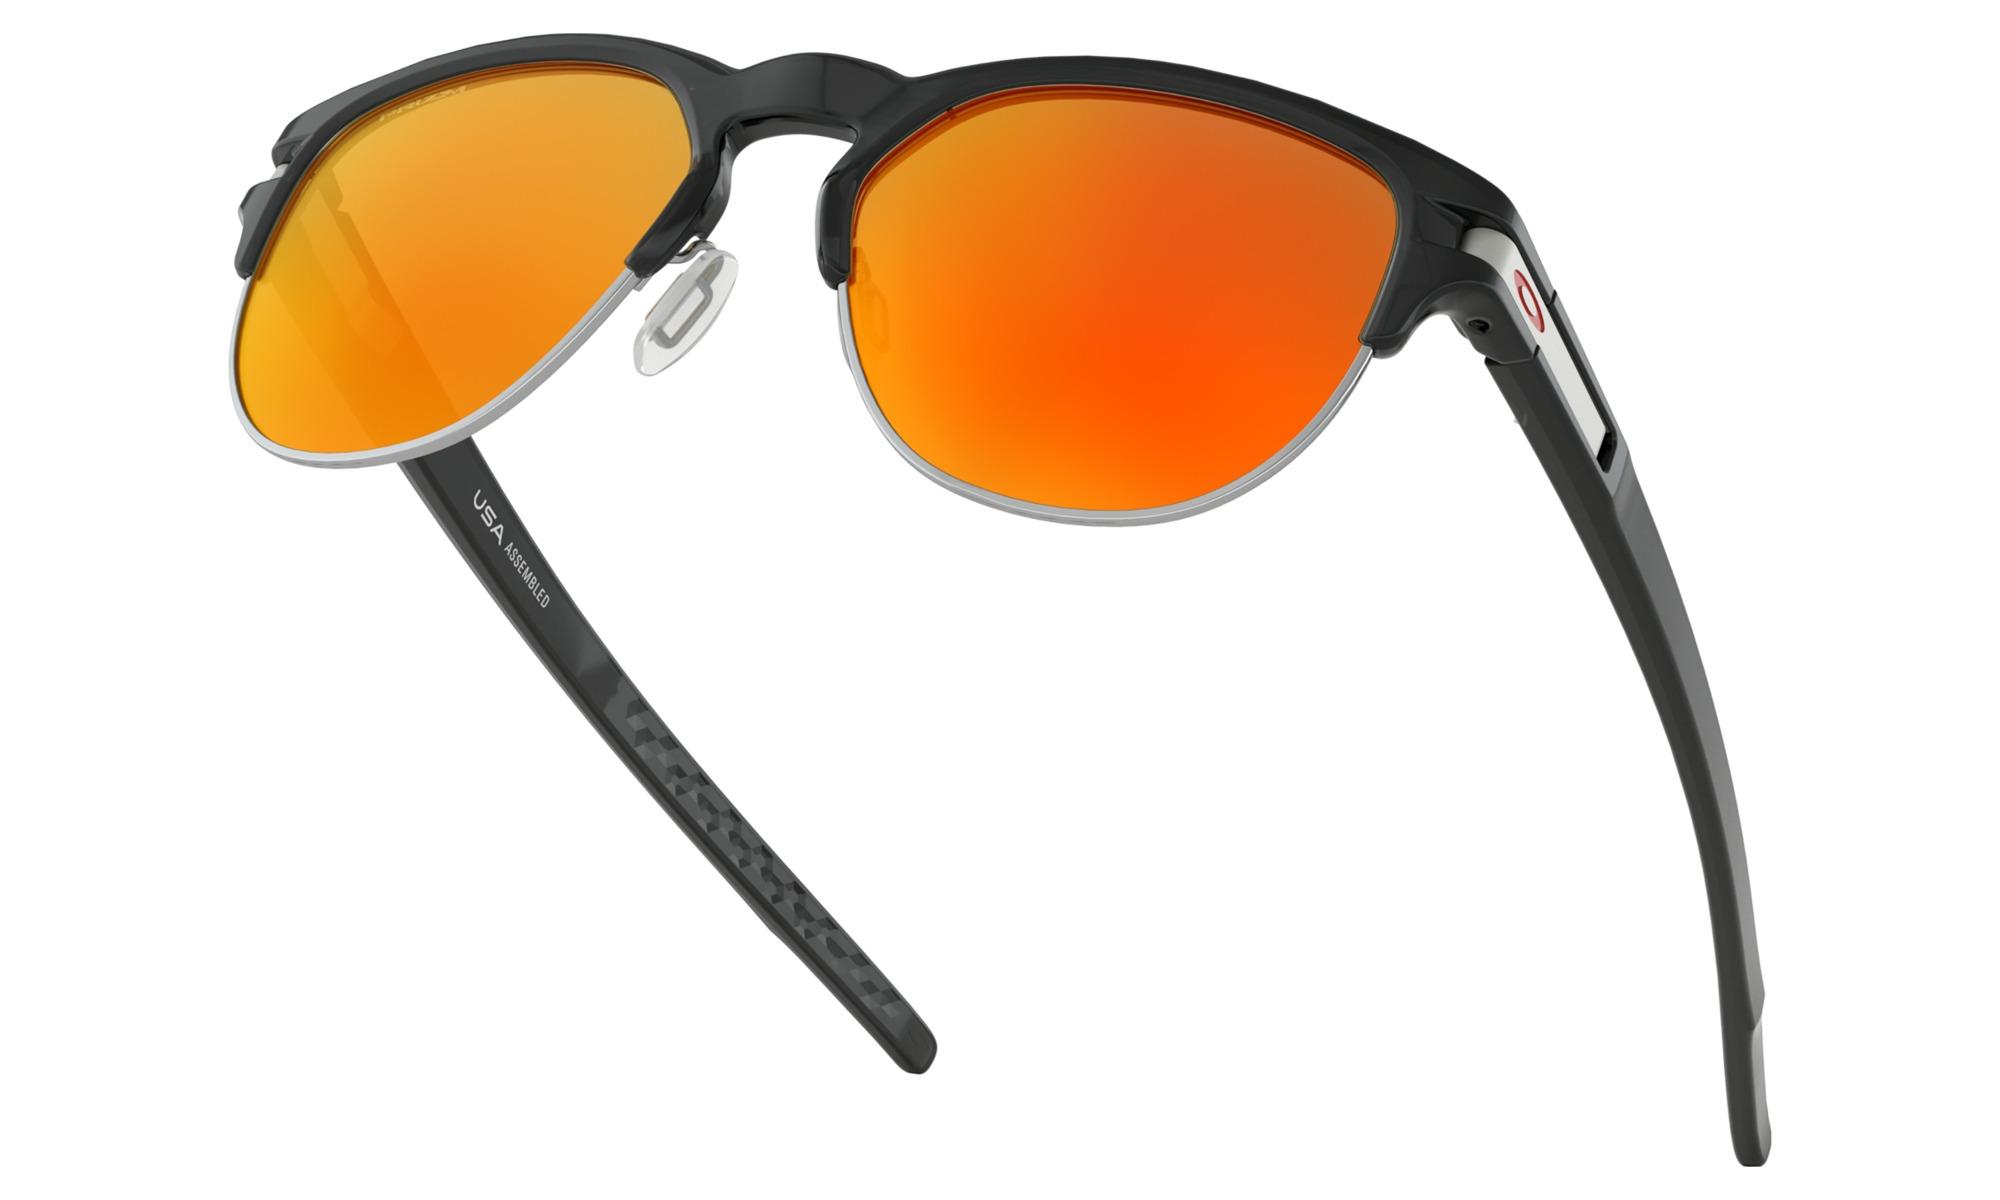 e3639161daa Oakley Latch Key M - Prizm Ruby - Emu Plains Optical